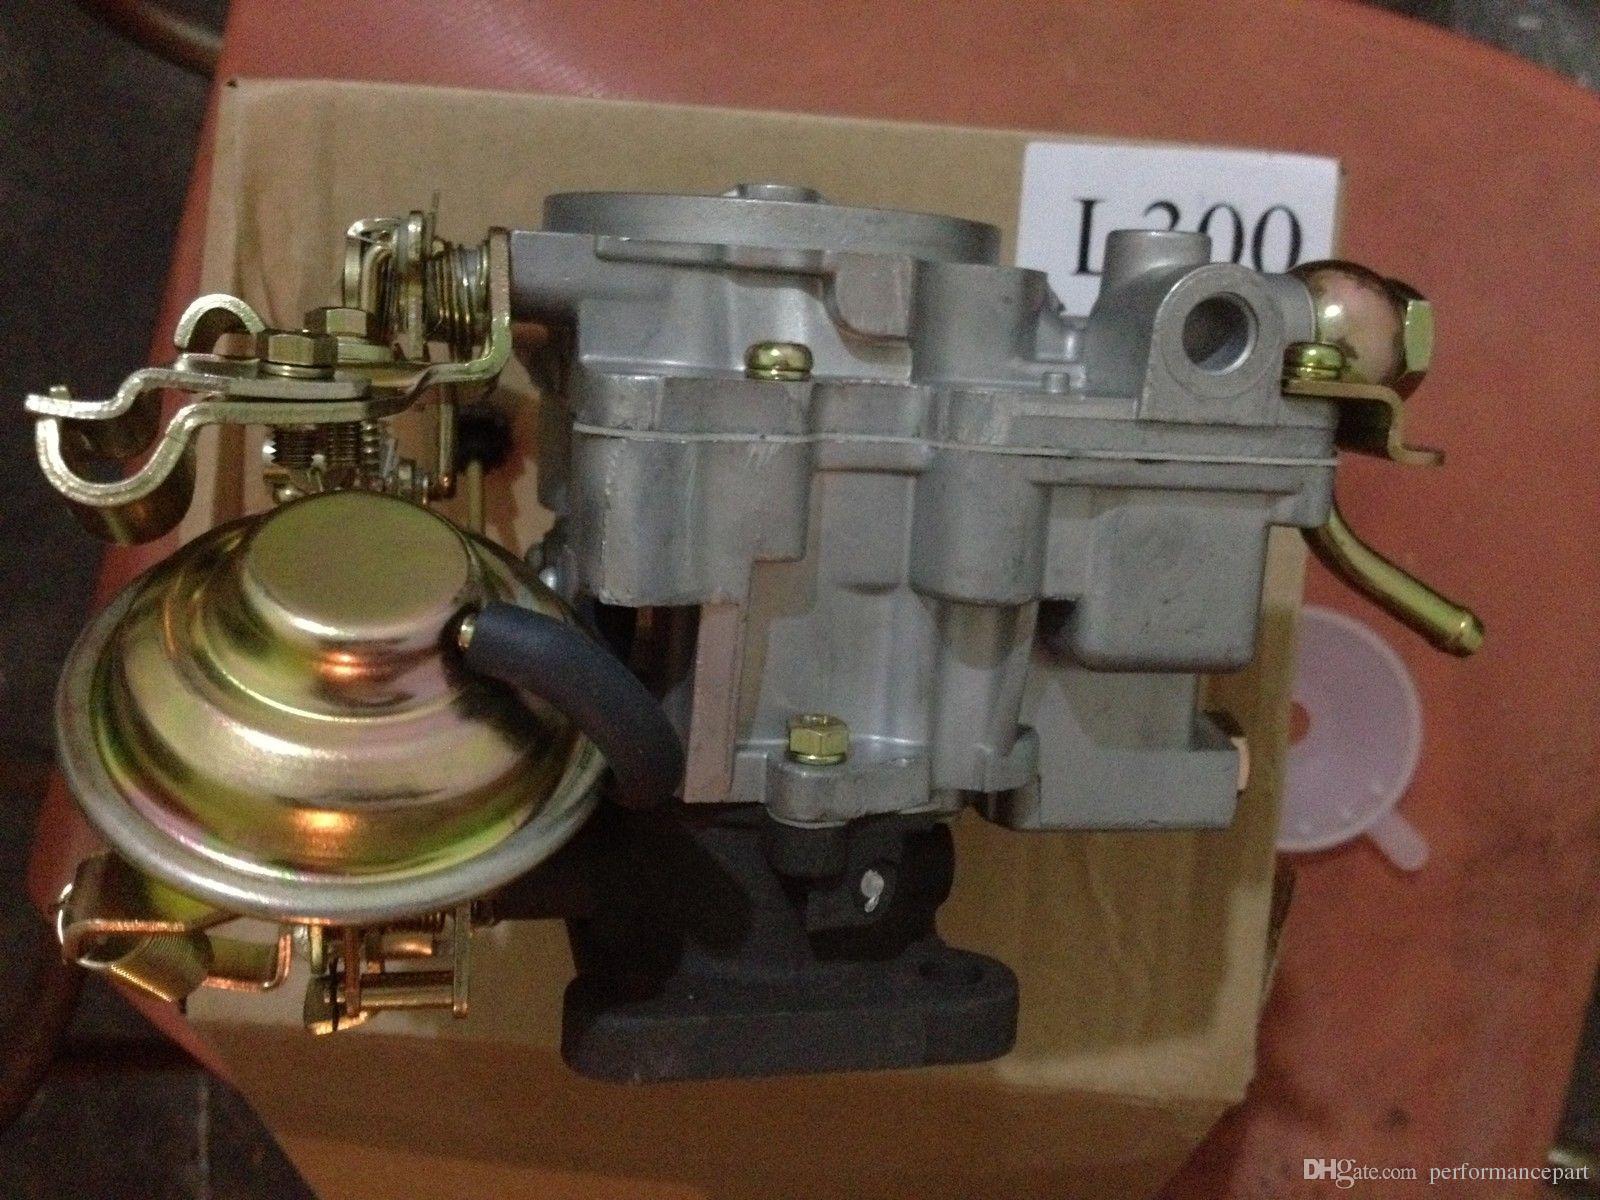 Yeni yedek karbüratör / mitsubishi L300 MD-081100 için karbonhidrat